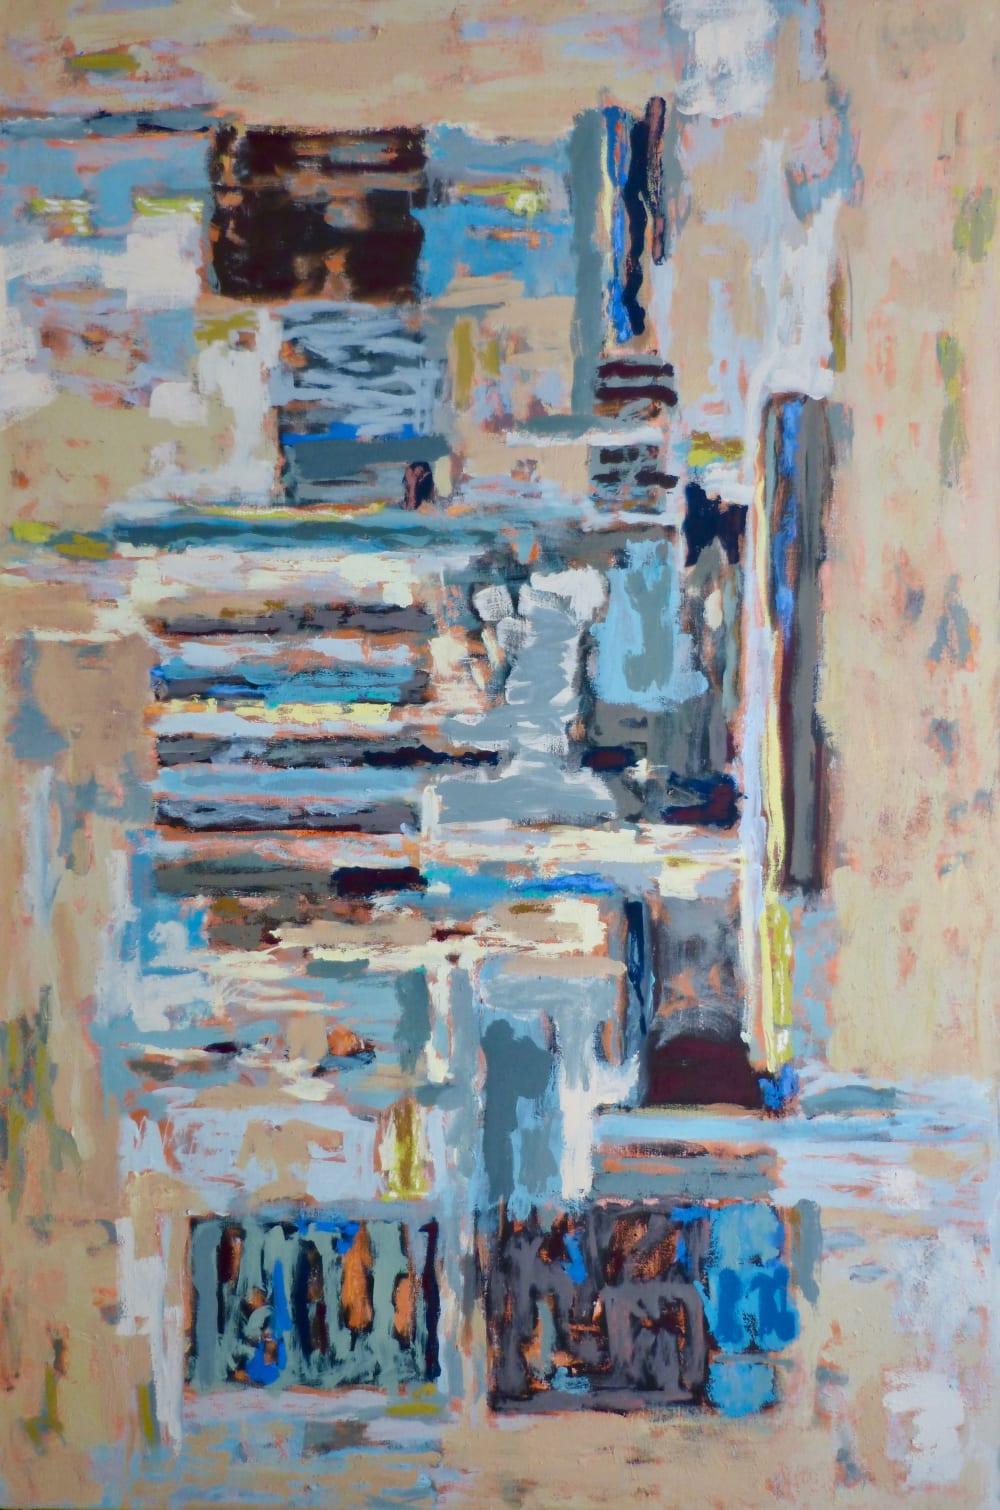 Composition II - Karin Boinet